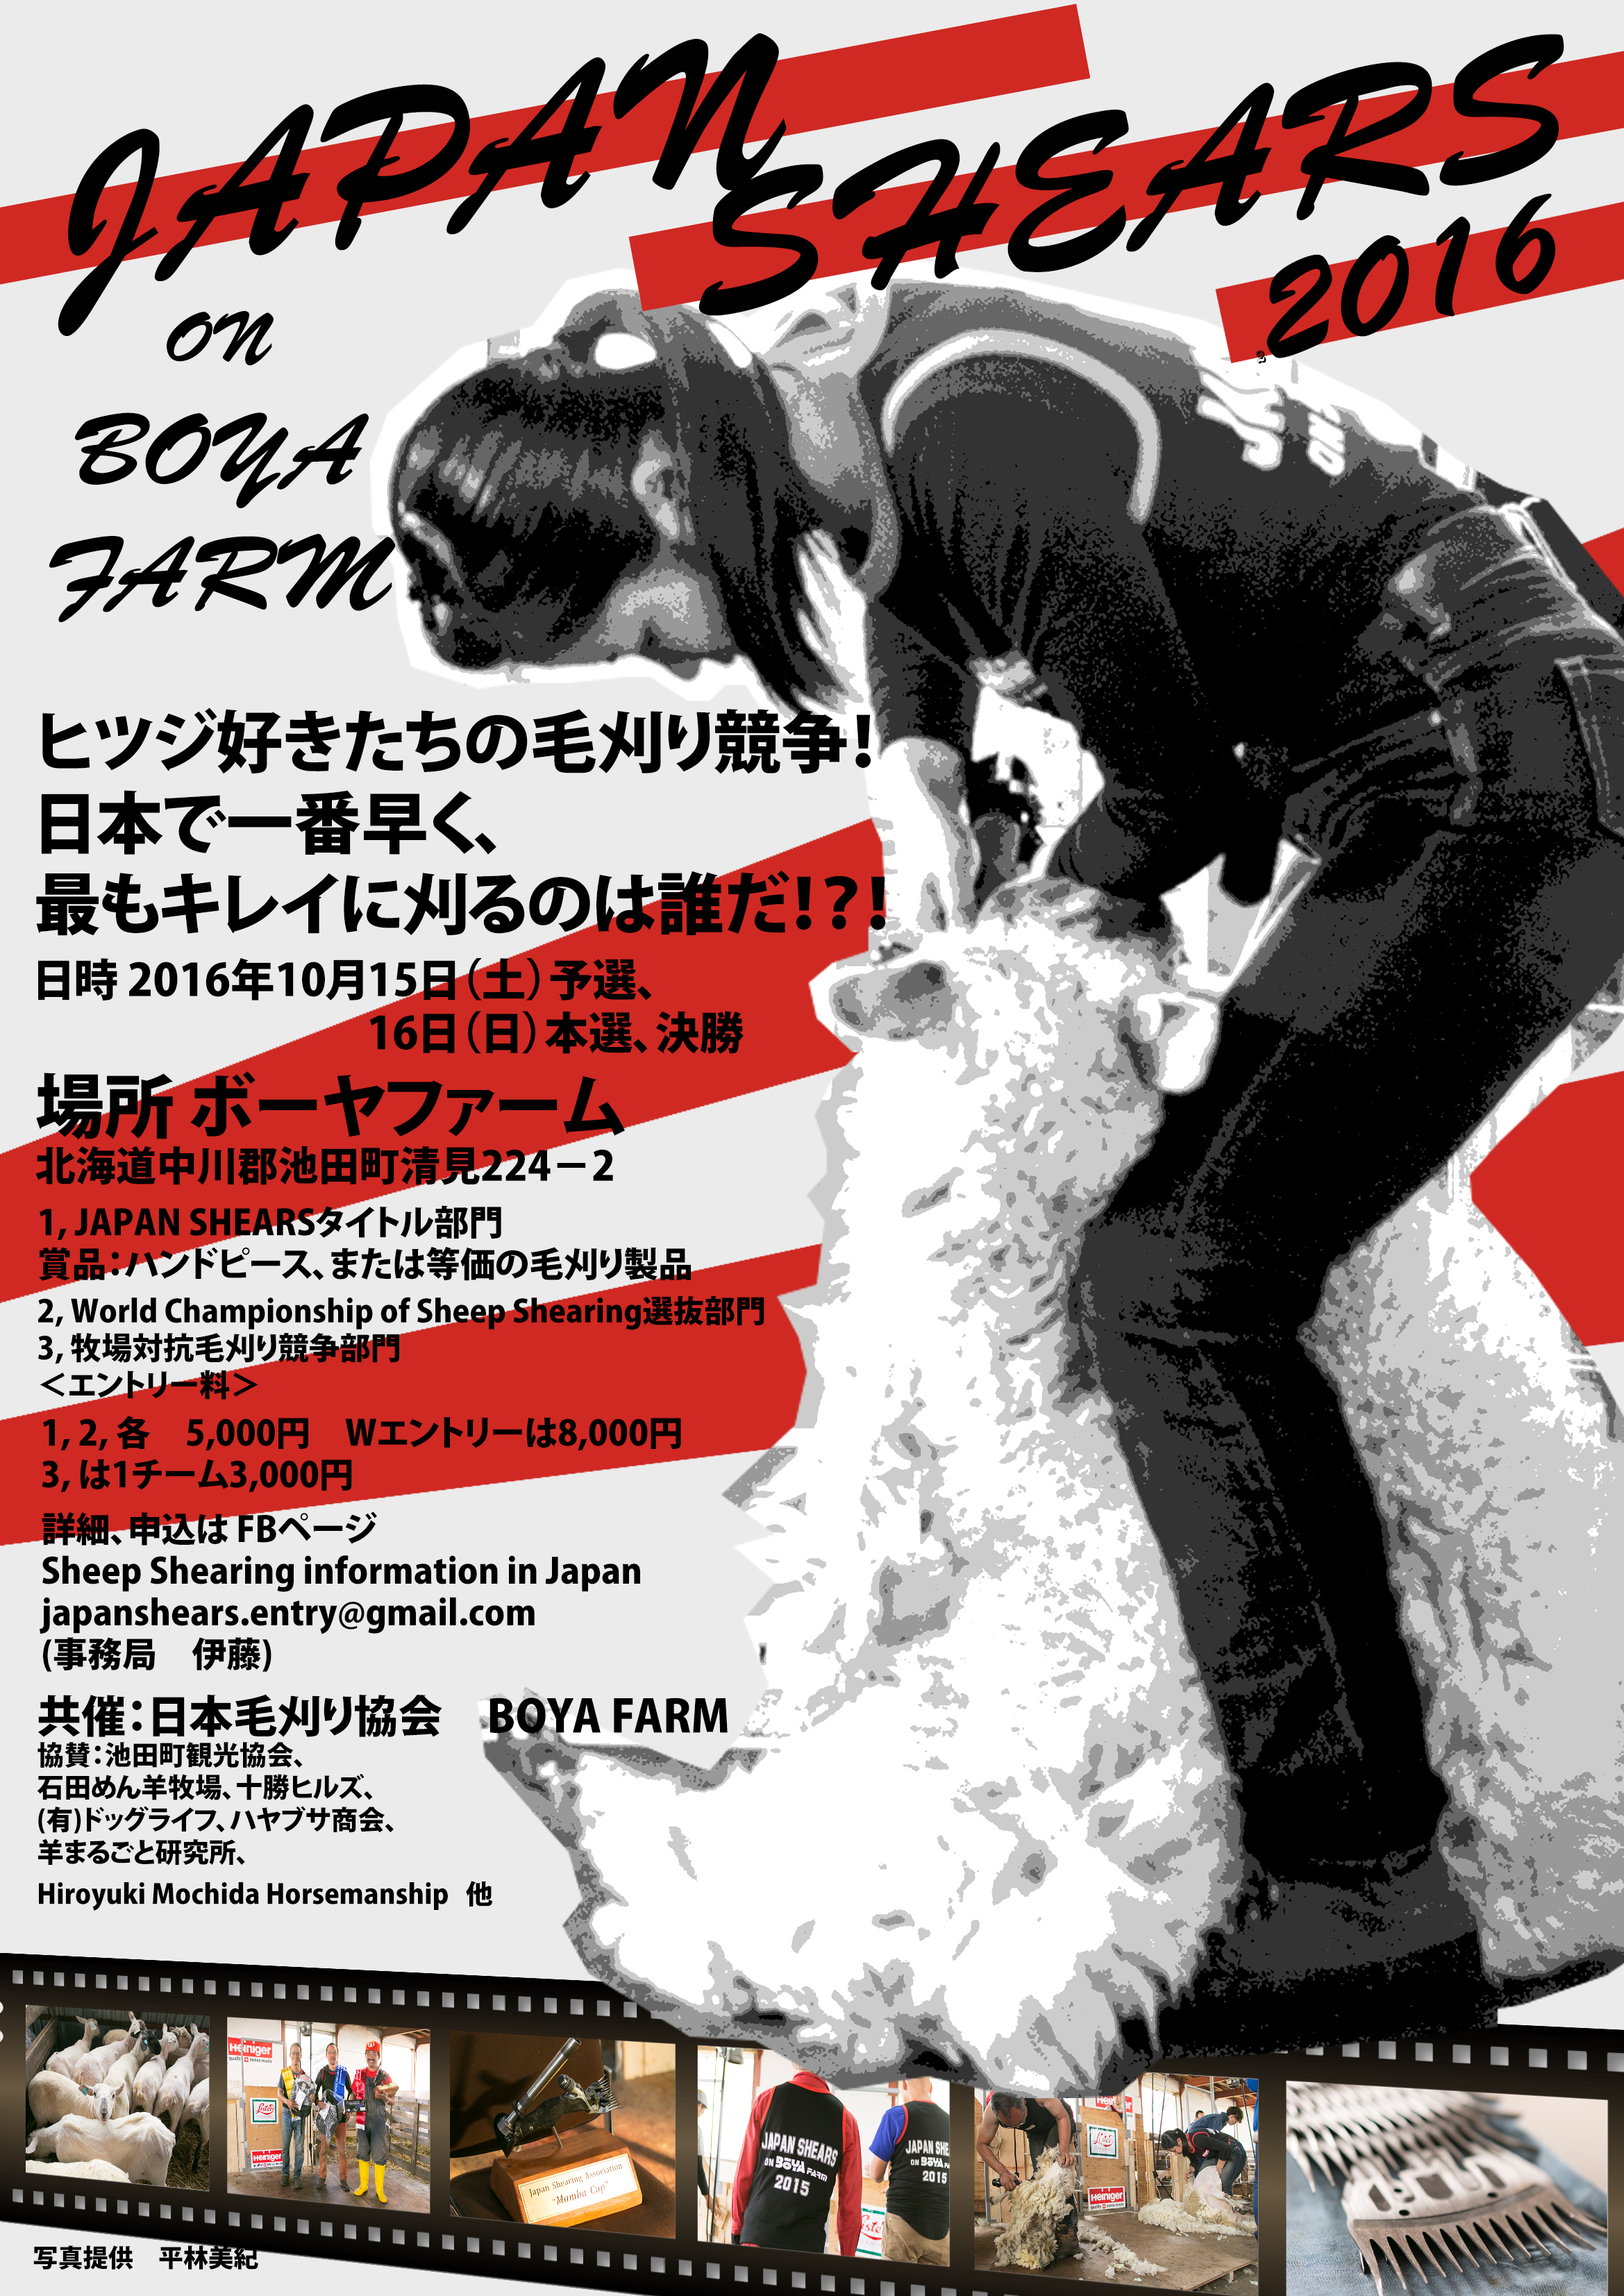 Japan shears 2016 poster